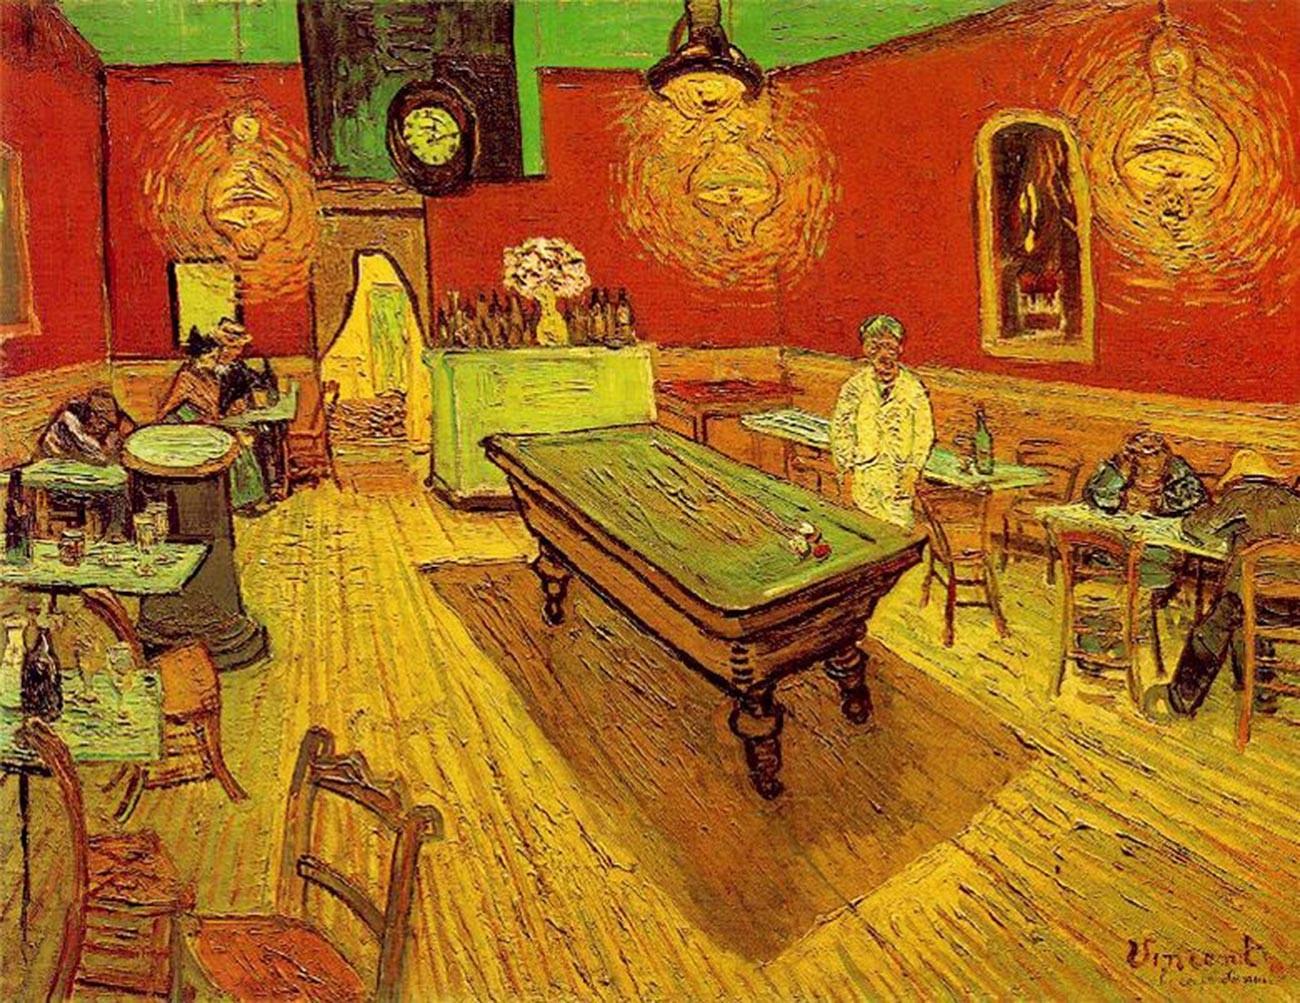 Vincent Van Gogh. The Night Café